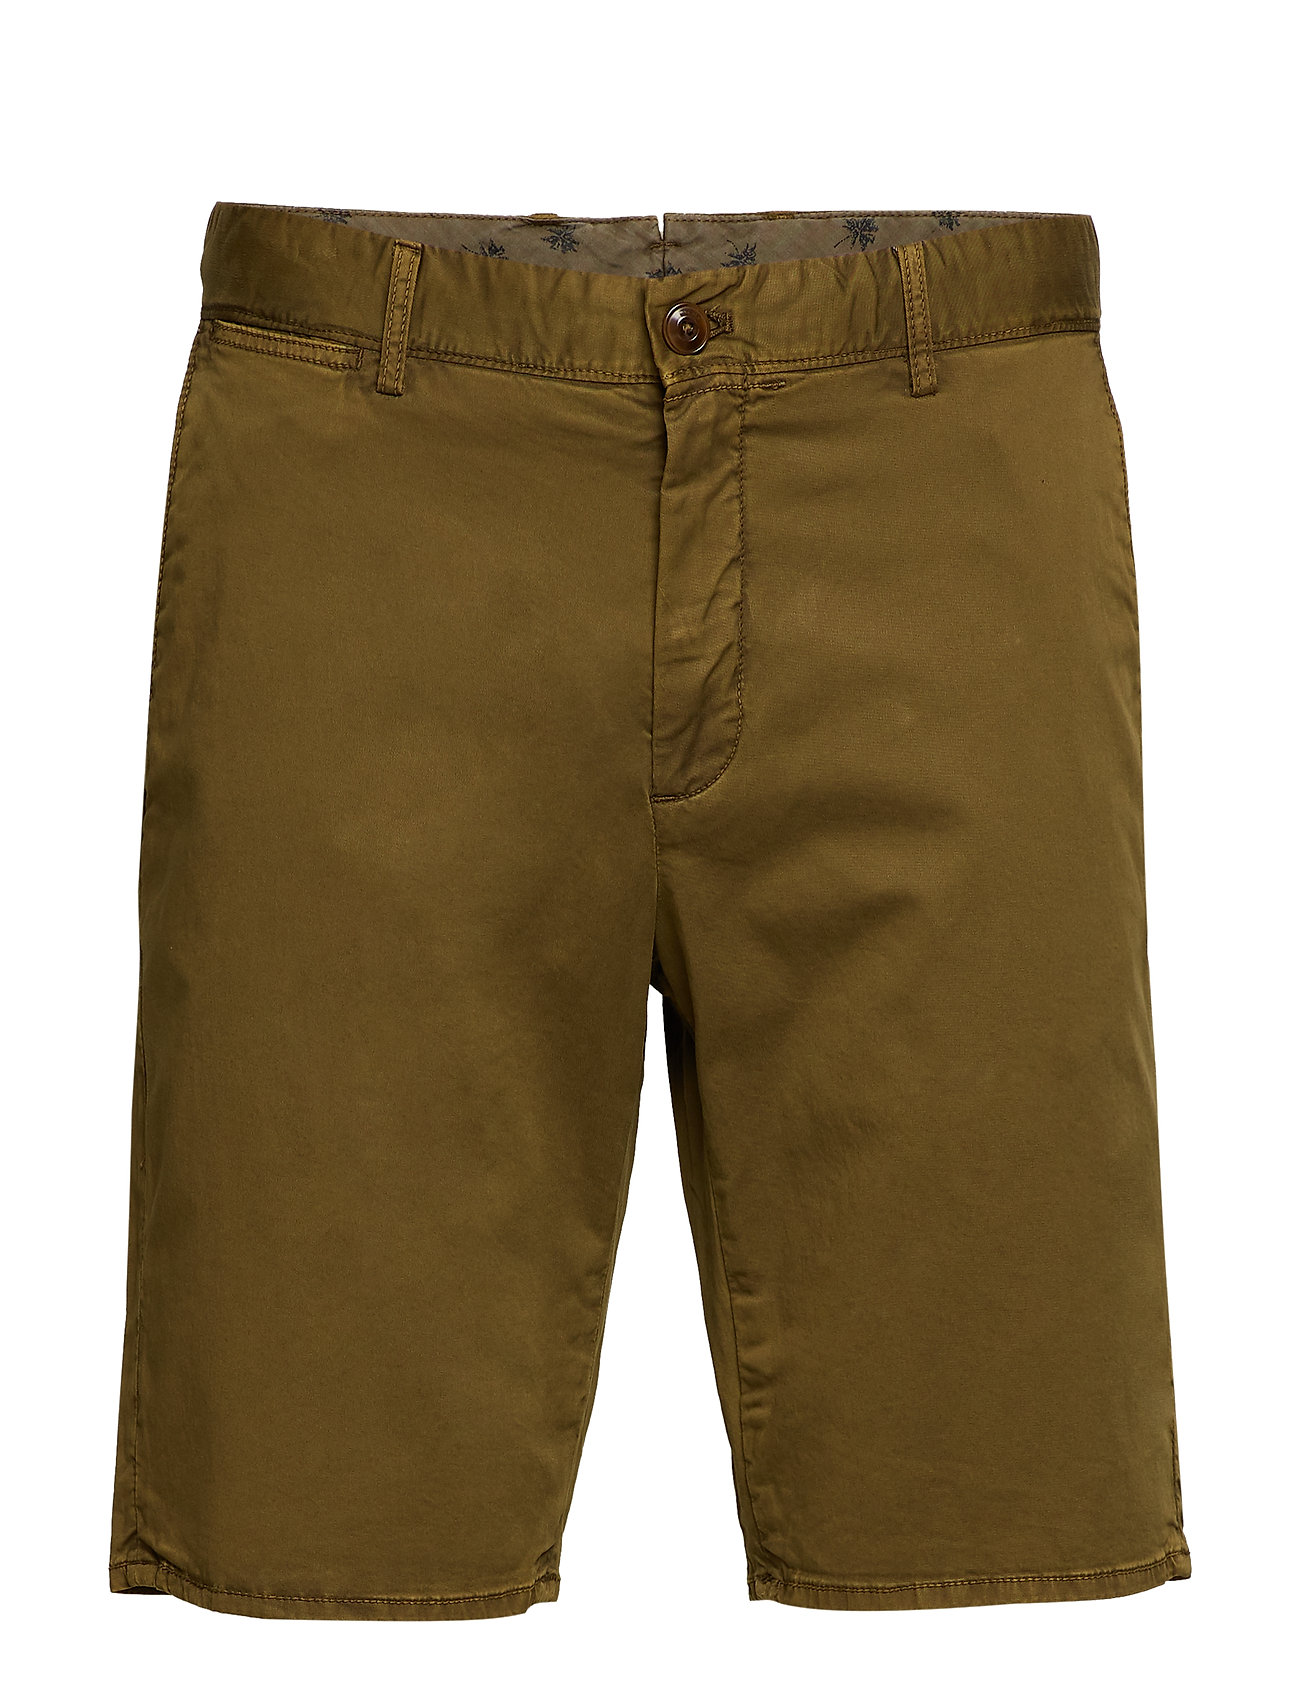 MANGO MAN Plain Cotton Chino Bermuda Shorts Shorts Chinos Shorts Grön MANGO MAN